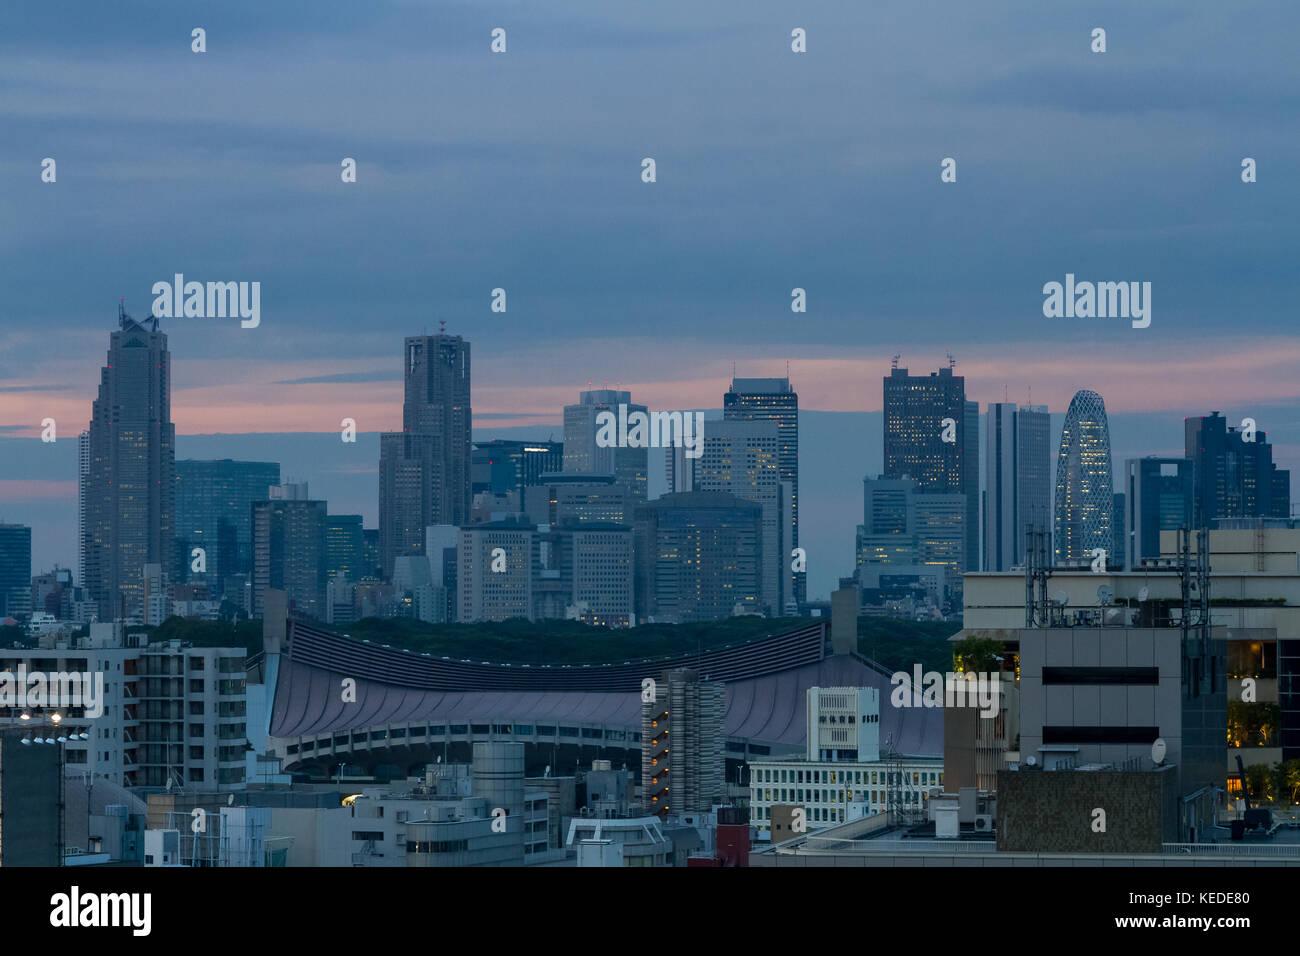 Shibuya, Tokyo, Giappone Venerdì 15 Settembre 2017 Immagini Stock